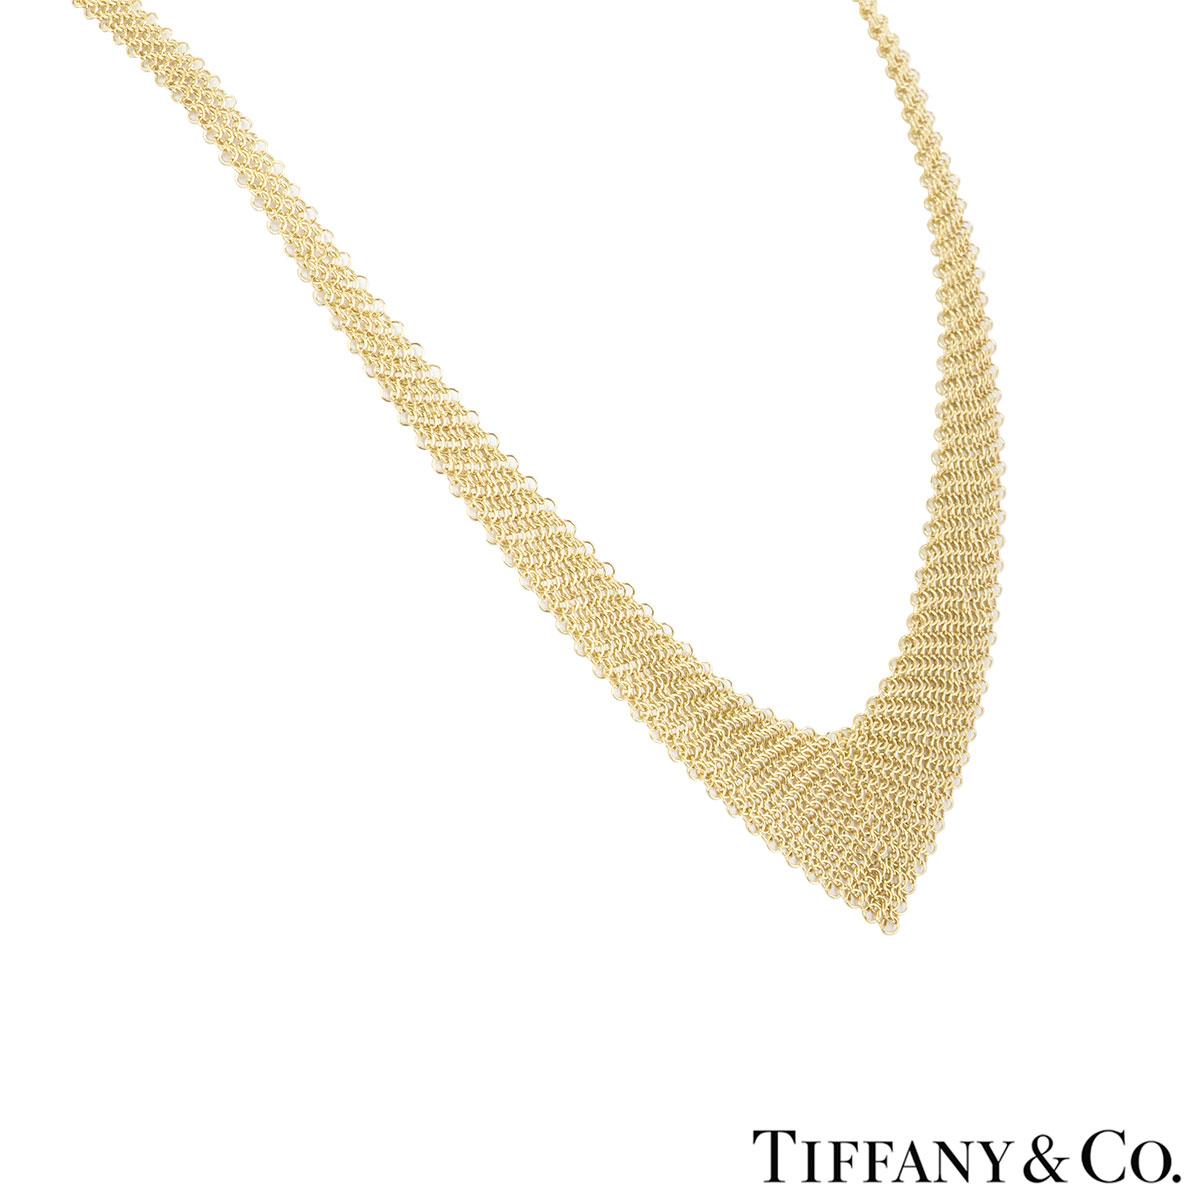 Tiffany & Co. Yellow Gold Elsa Peretti Mesh Bib Necklace